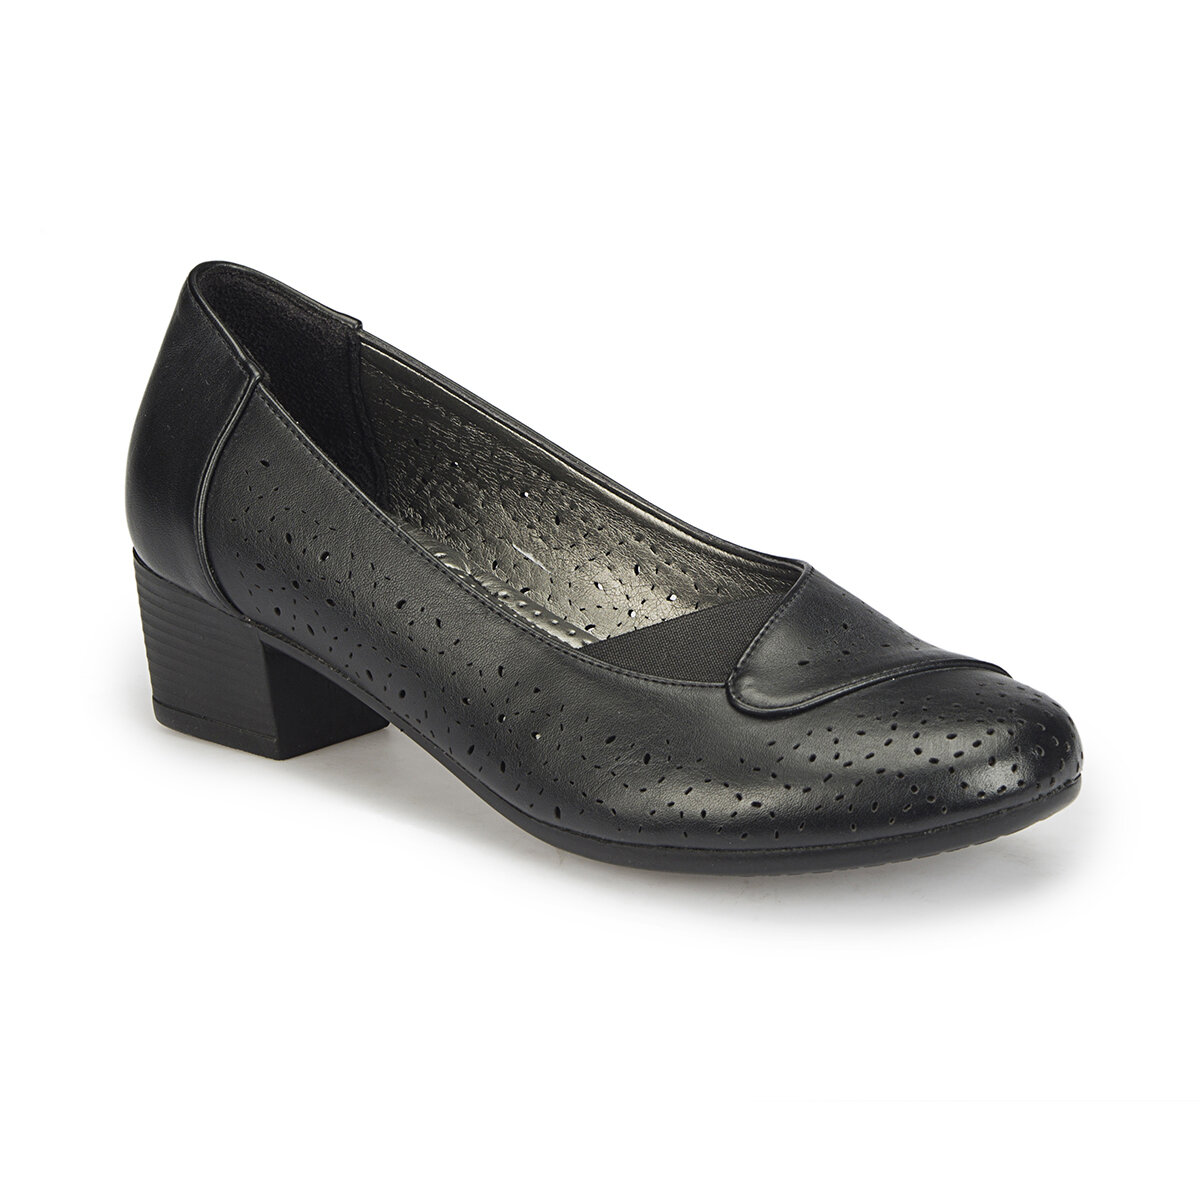 FLO 81.158499.Z Black Women Gova Shoes Polaris